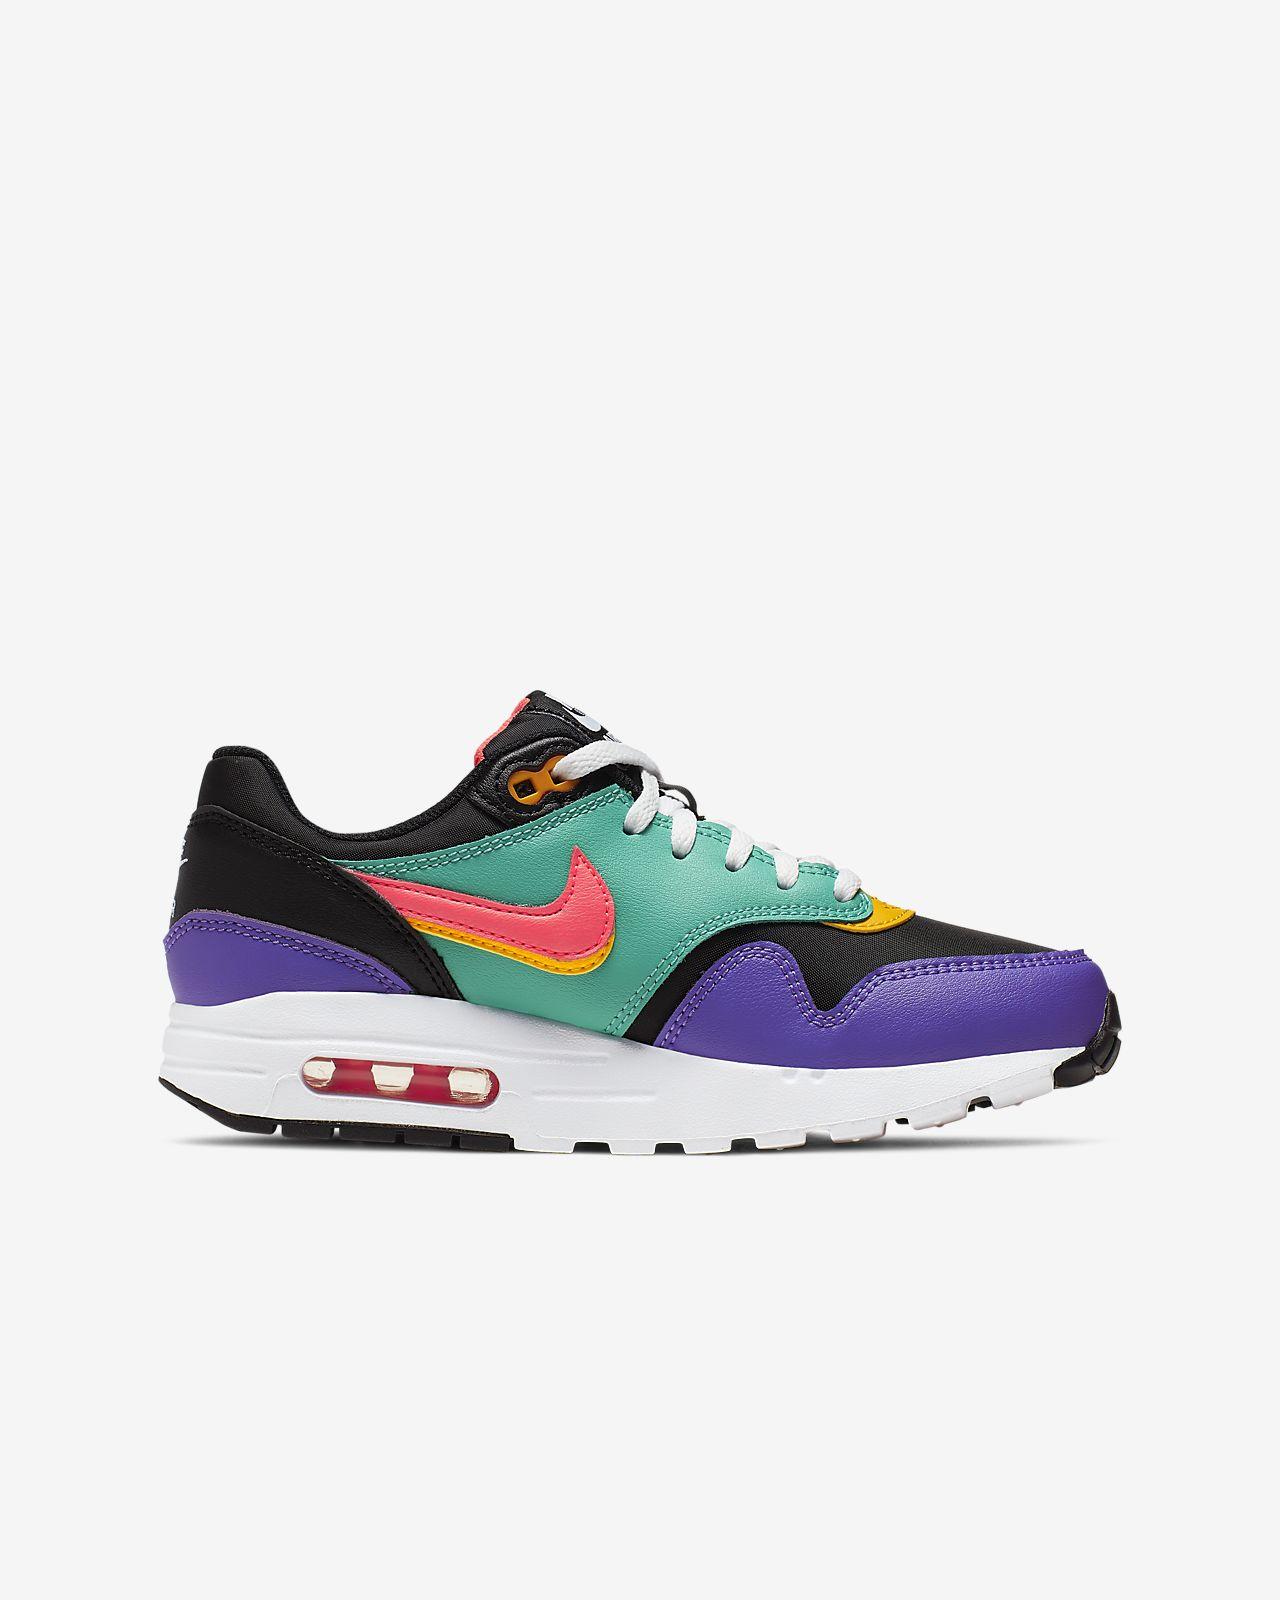 Nike Air Max 1 Game Change Big Kids' Shoe